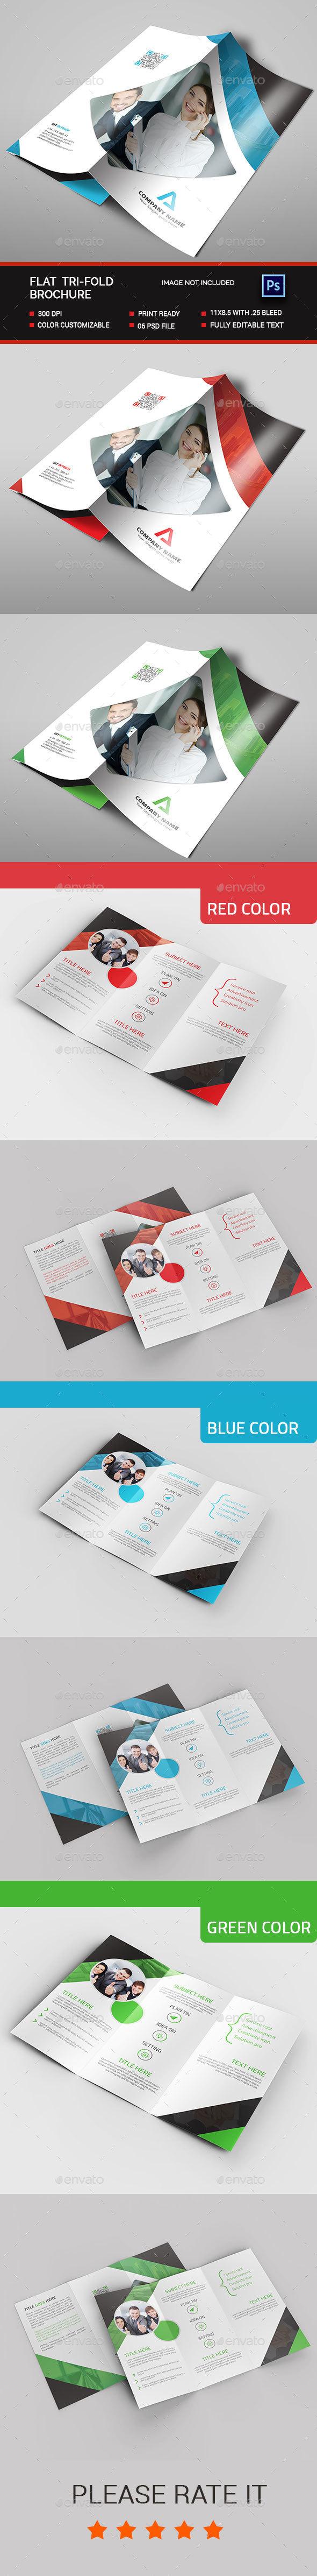 Flat Tri-fold Brochure - Brochures Print Templates